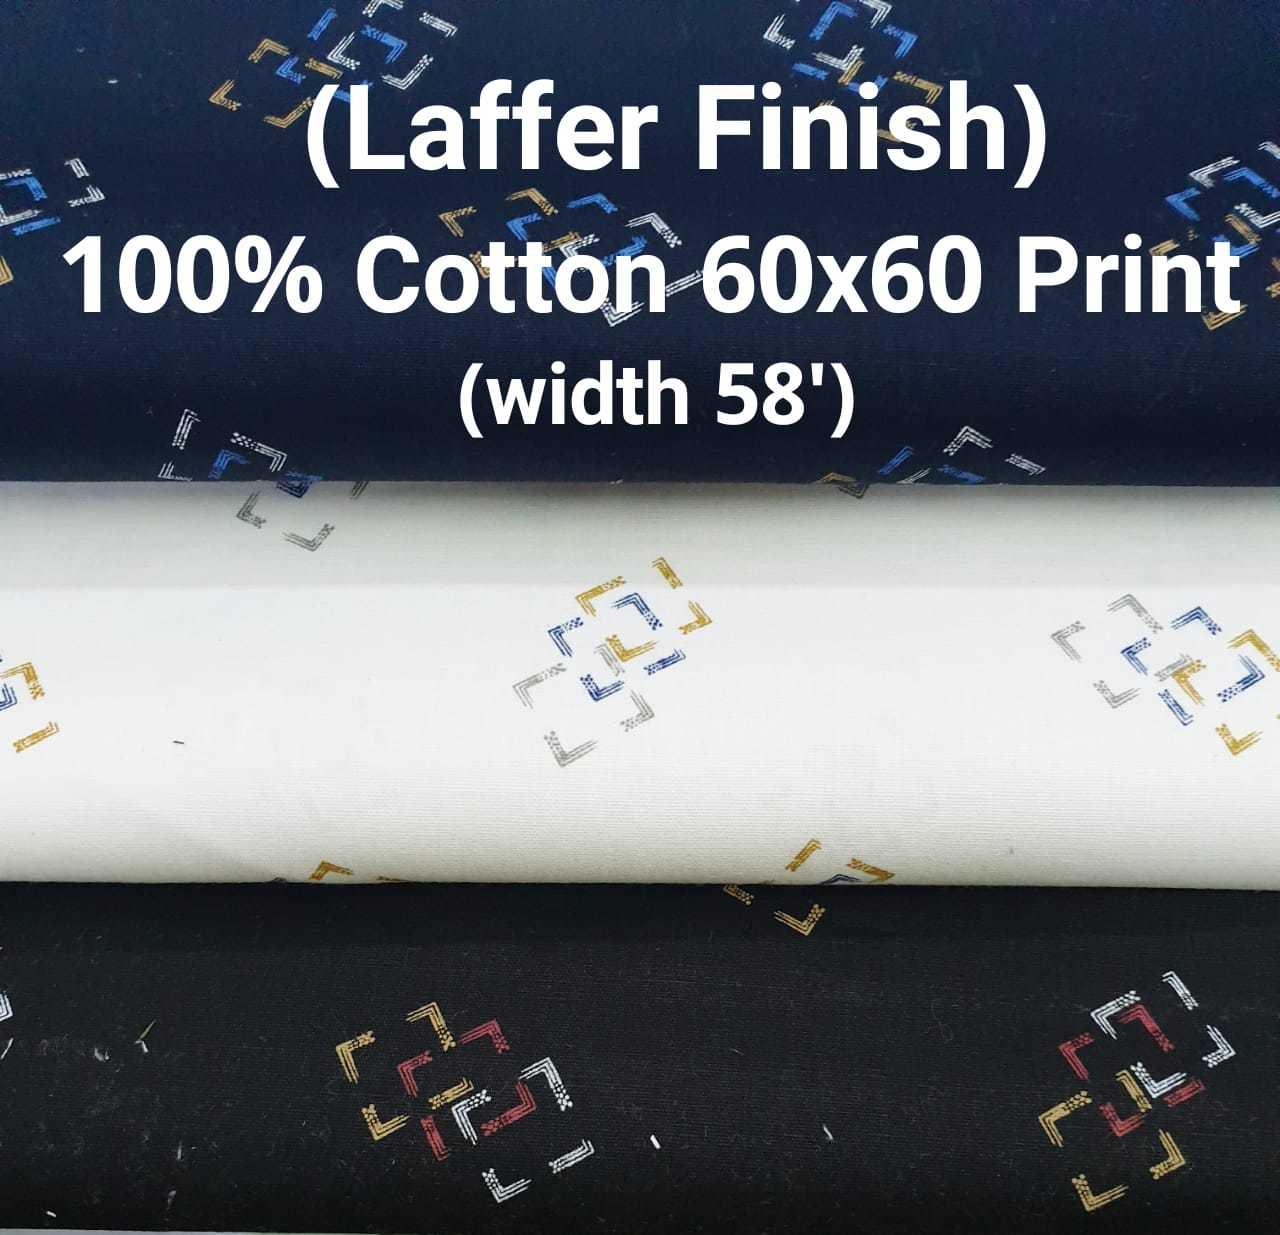 LAFFER FINISH 100% cotton 60*60 discharge print